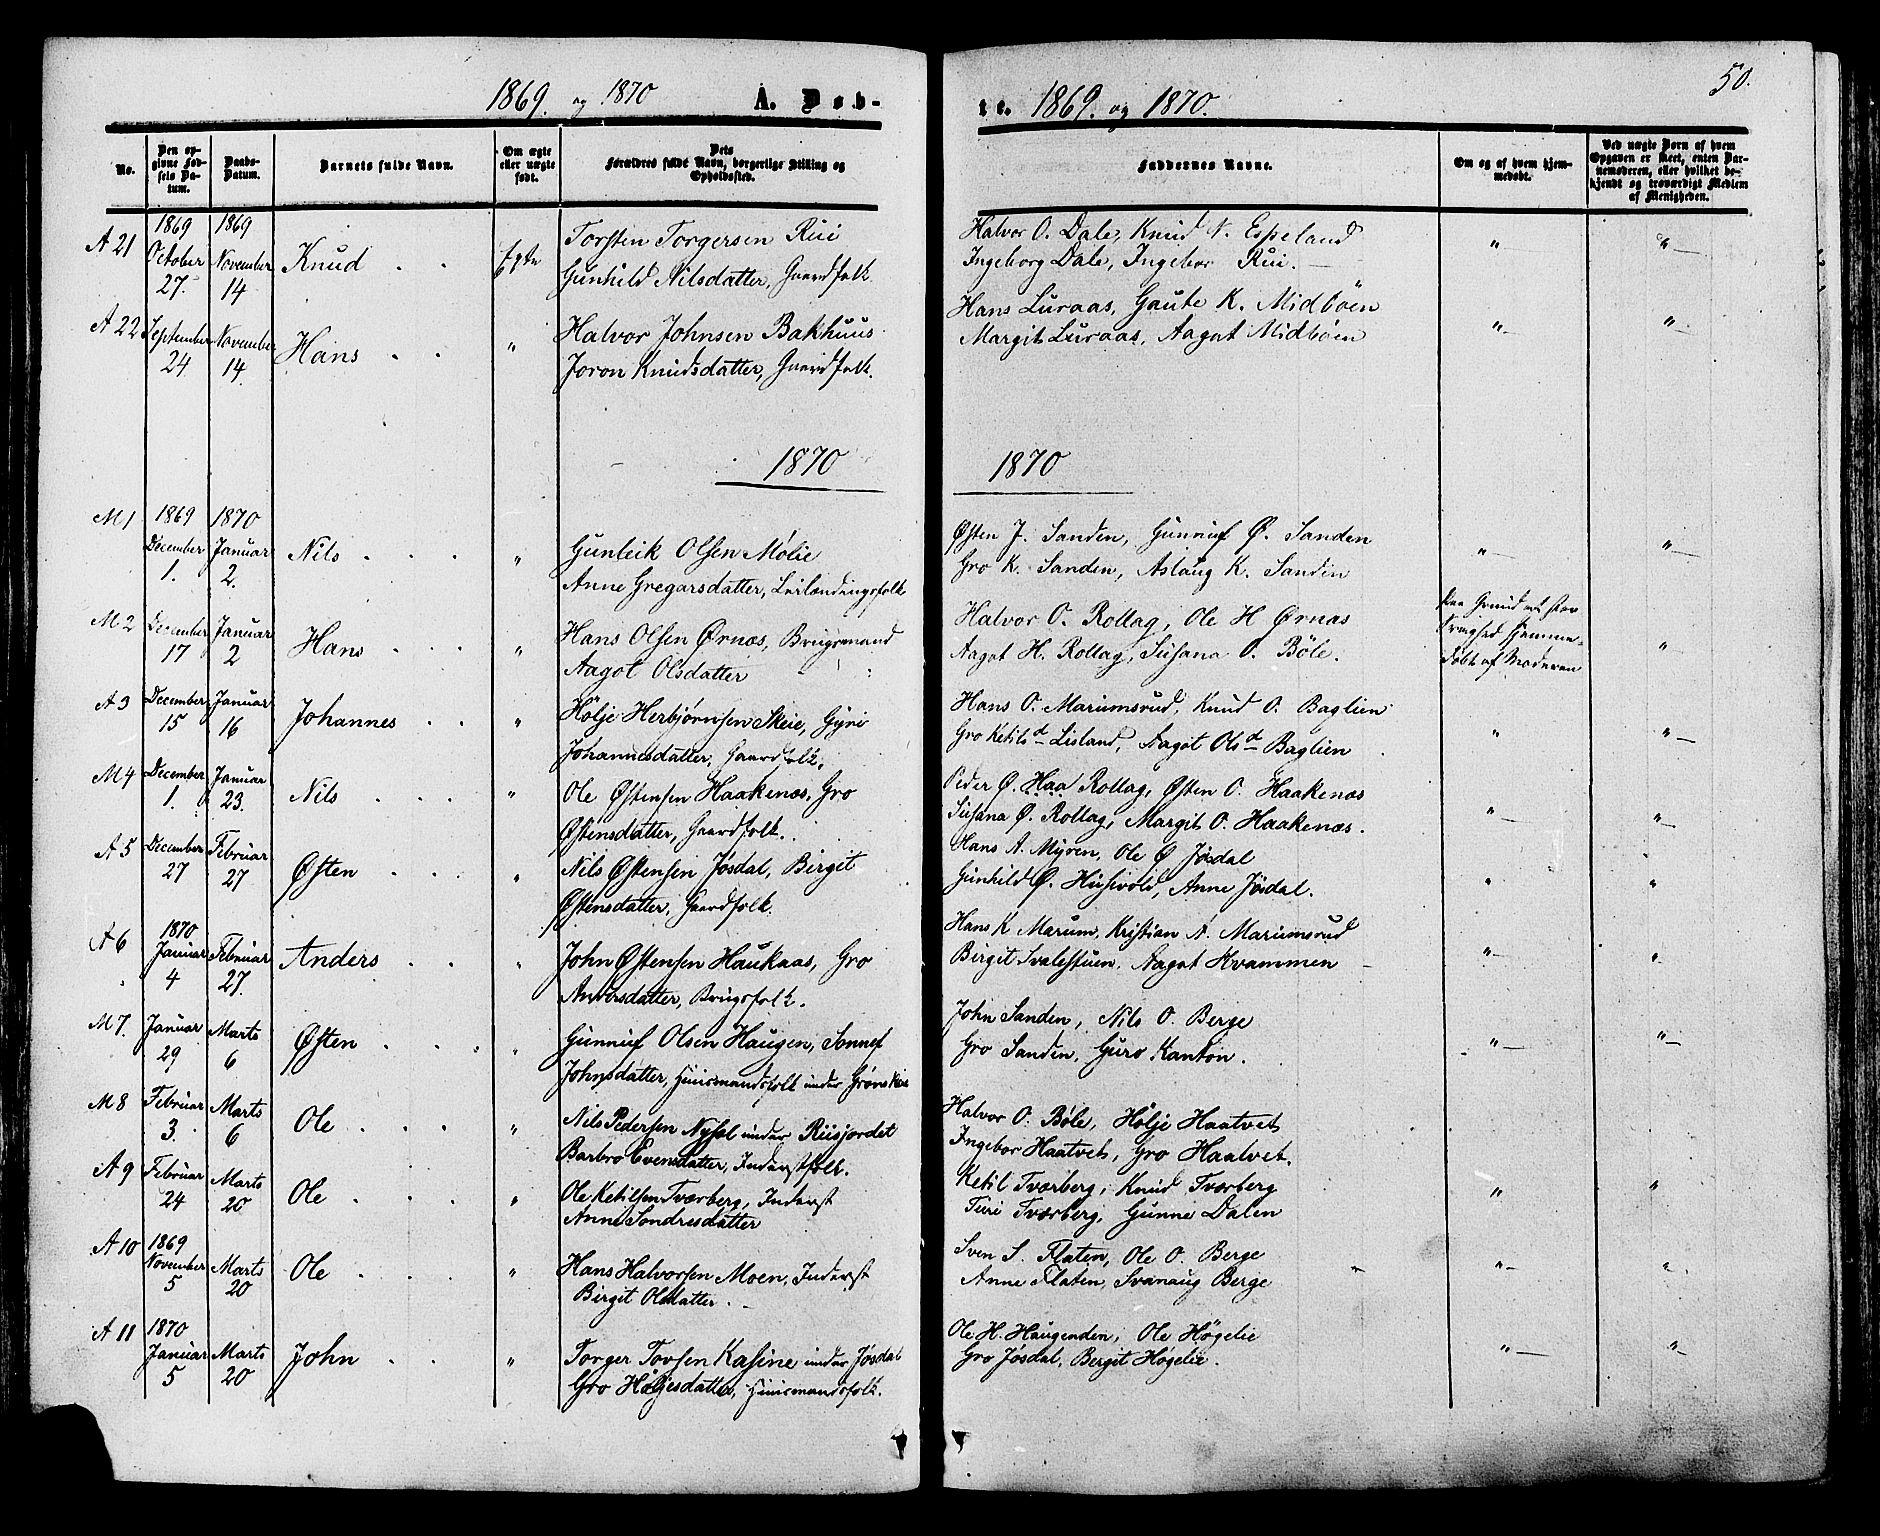 SAKO, Tinn kirkebøker, F/Fa/L0006: Ministerialbok nr. I 6, 1857-1878, s. 50